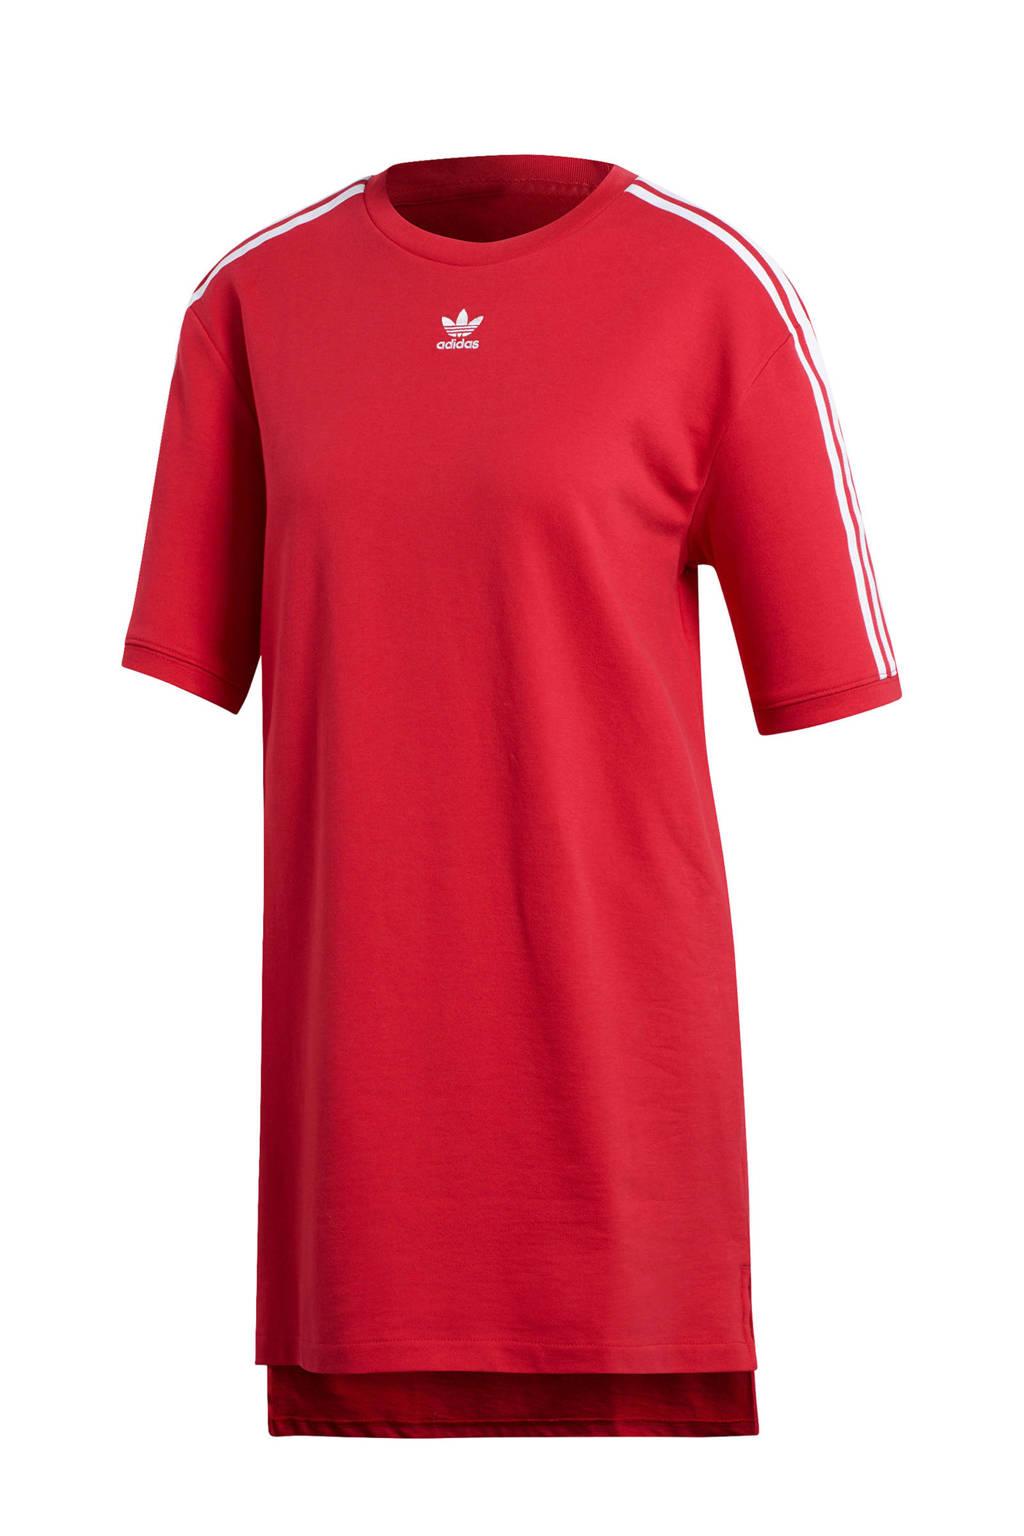 adidas originals T-shirtjurk rood/wit, Rood/wit